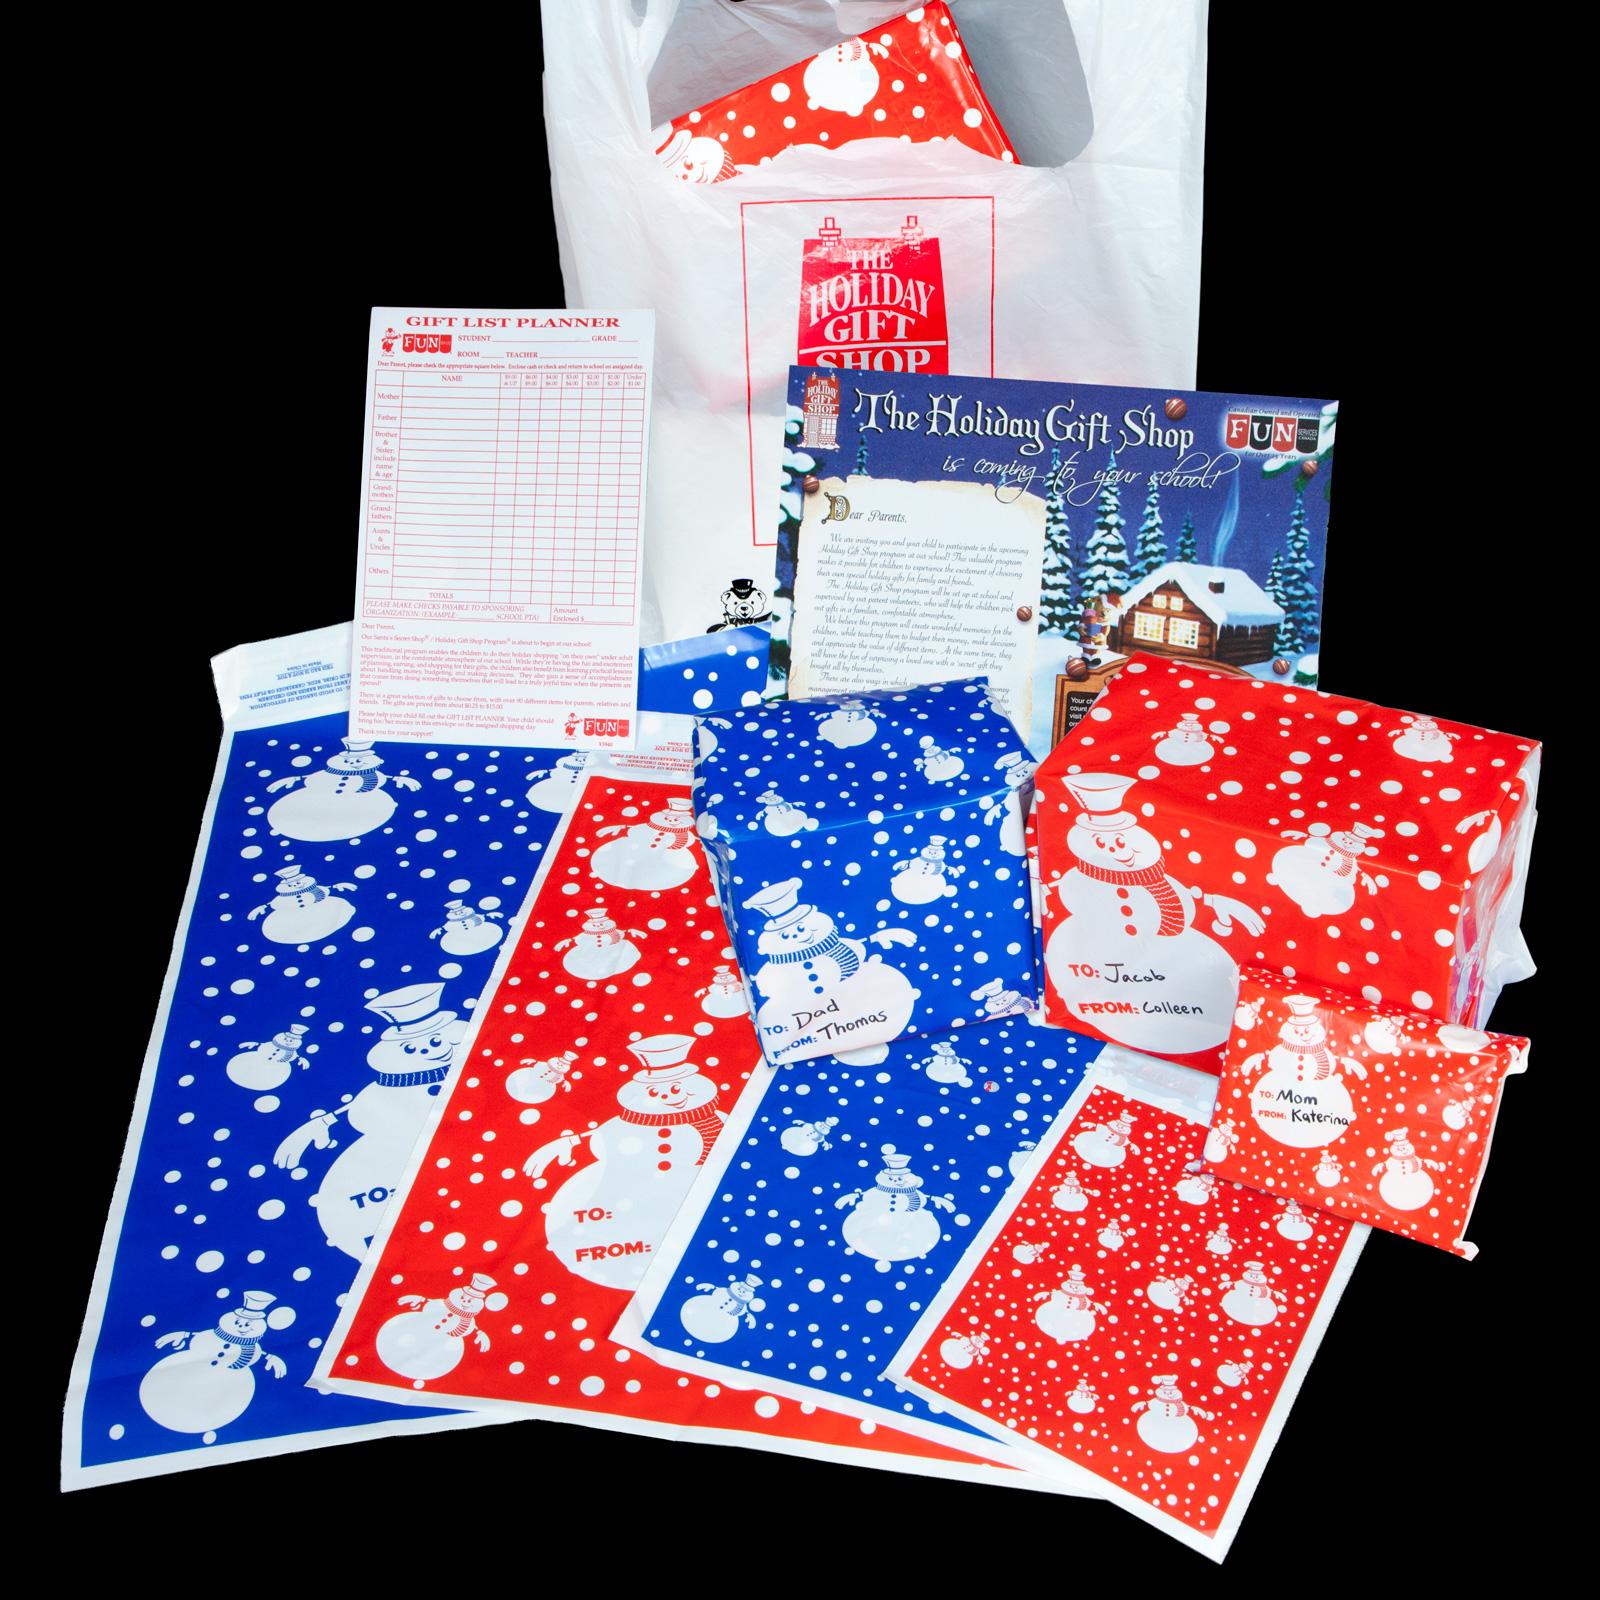 Gift-Bags-and-Promo-Stuff@3x.jpg